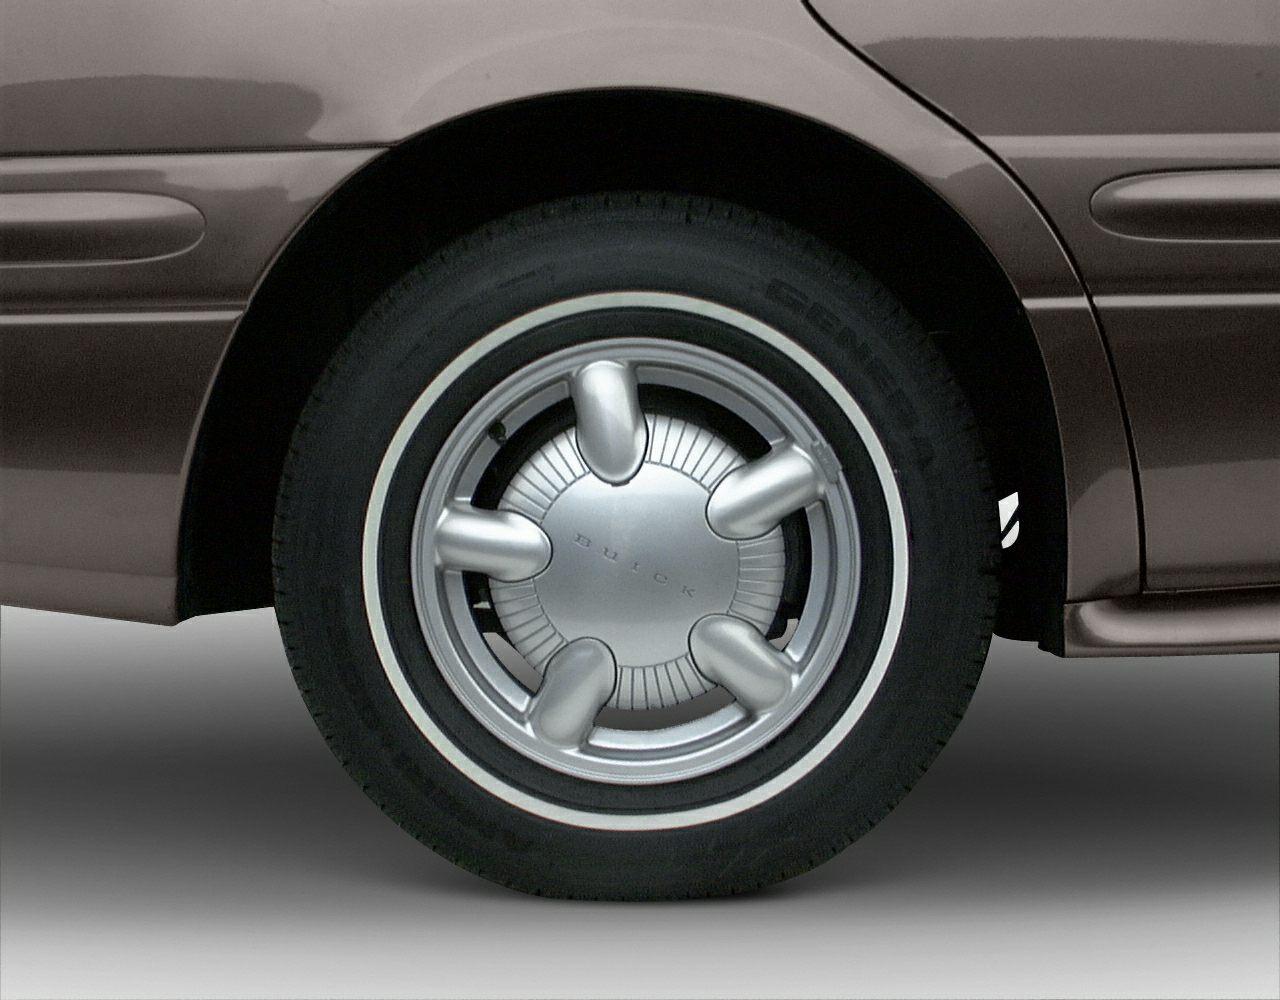 2000 Buick LeSabre Exterior Photo